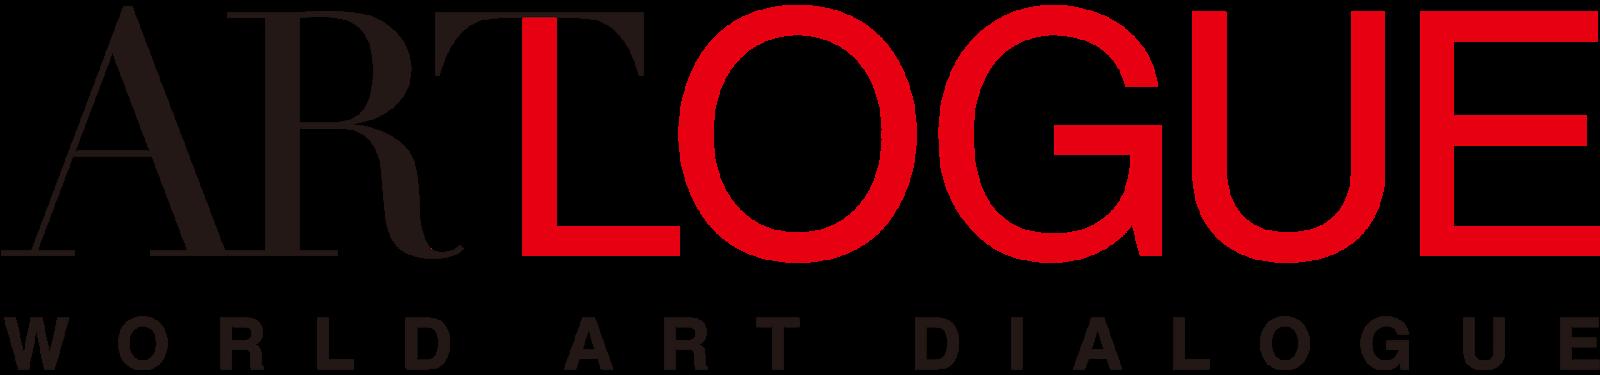 ARTLOGUE ロゴ